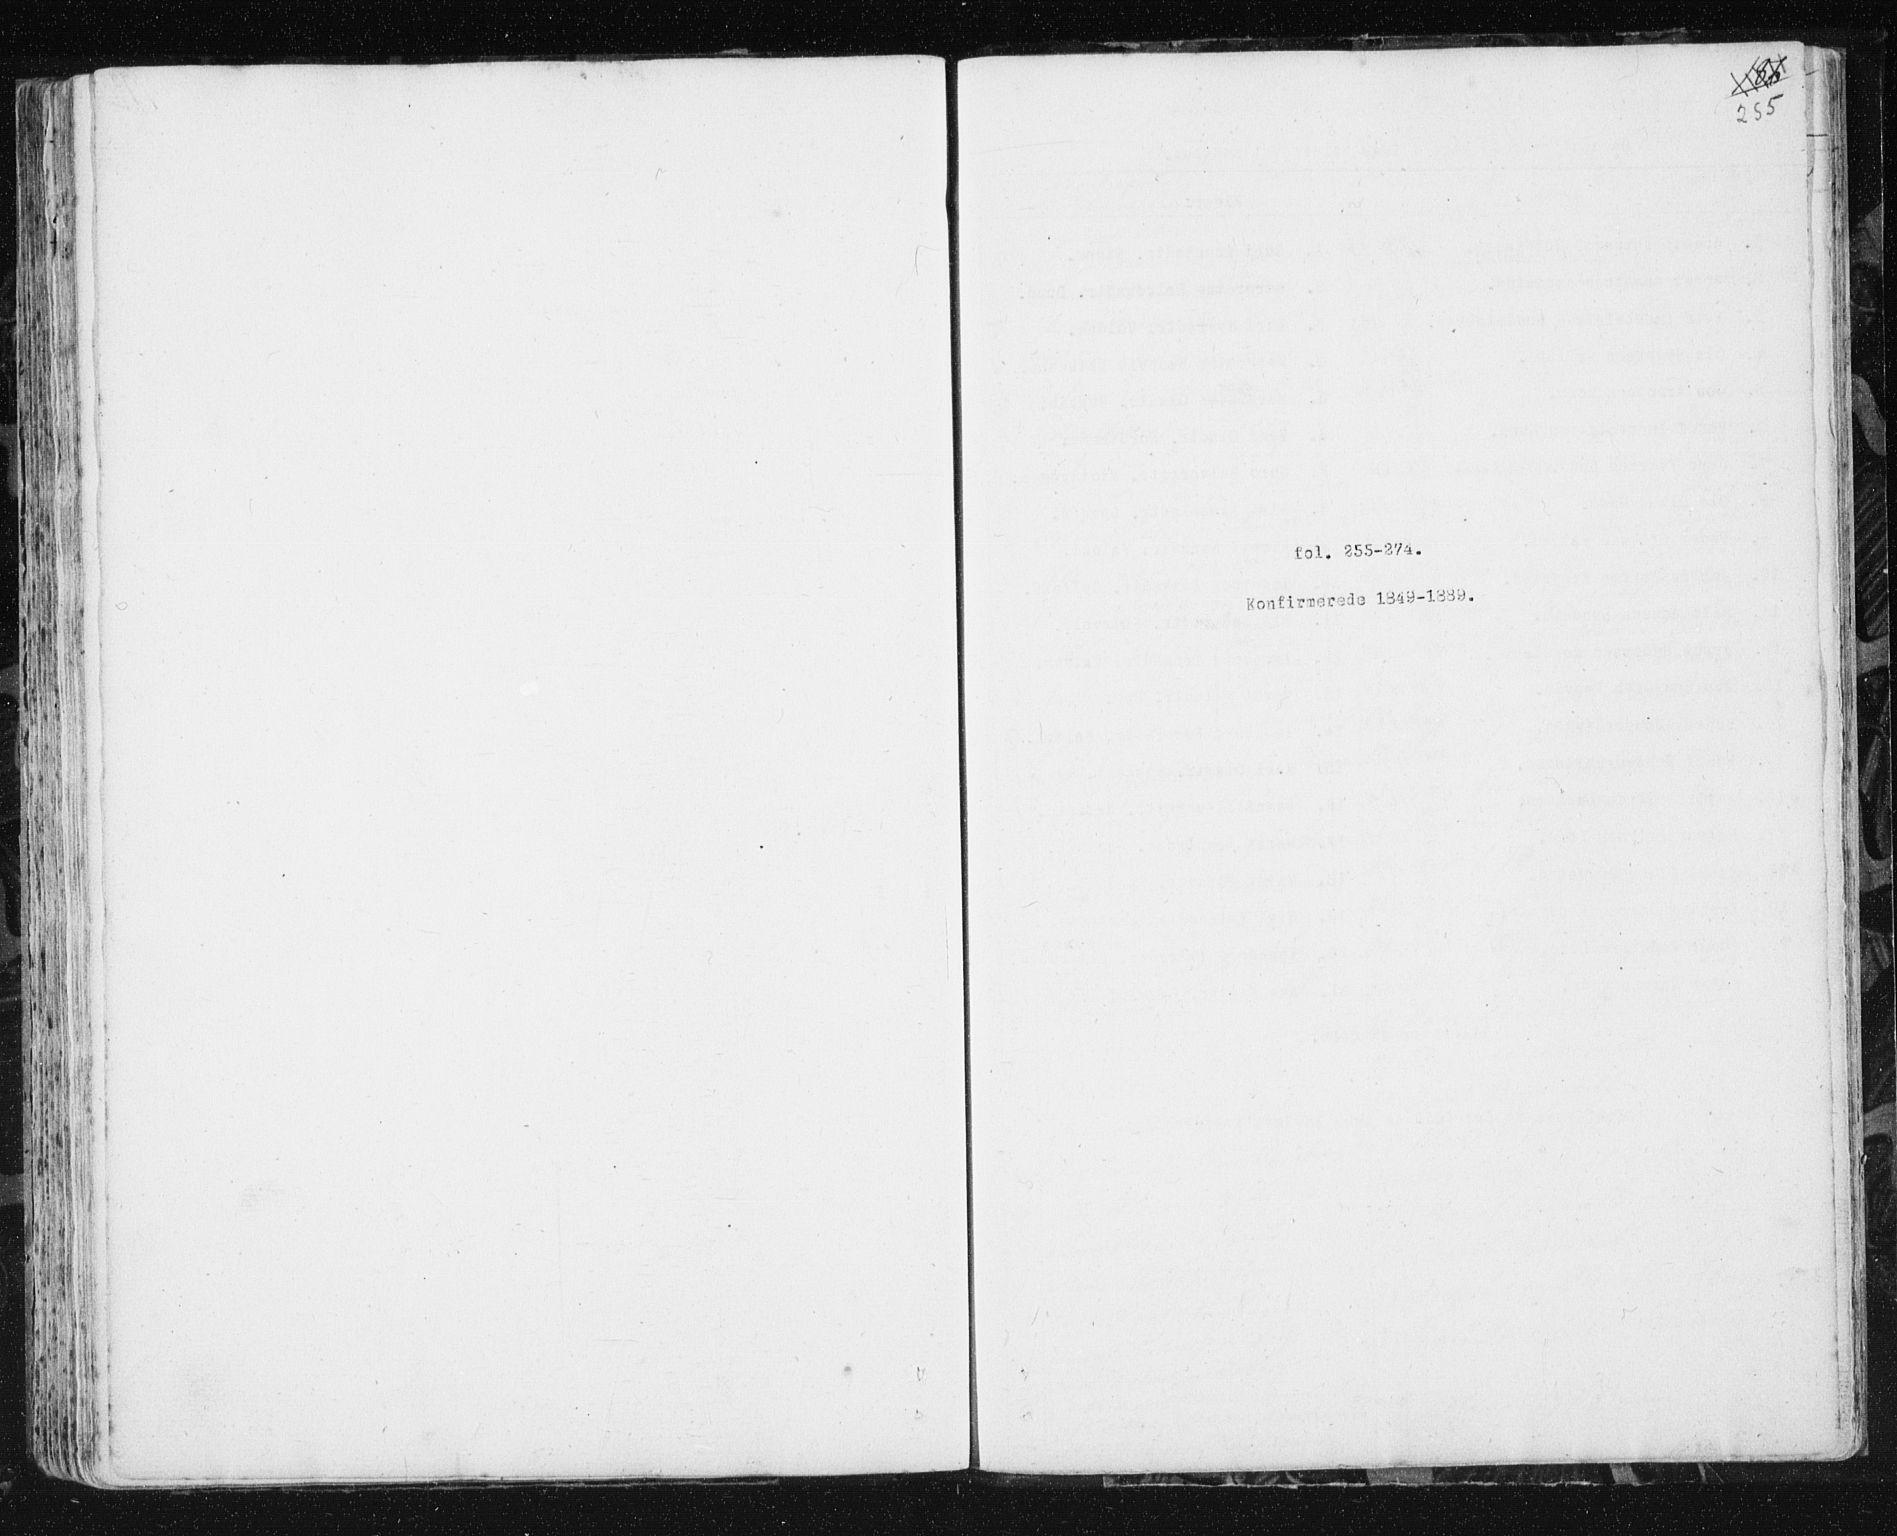 SAT, Ministerialprotokoller, klokkerbøker og fødselsregistre - Sør-Trøndelag, 692/L1110: Parish register (copy) no. 692C05, 1849-1889, p. 255